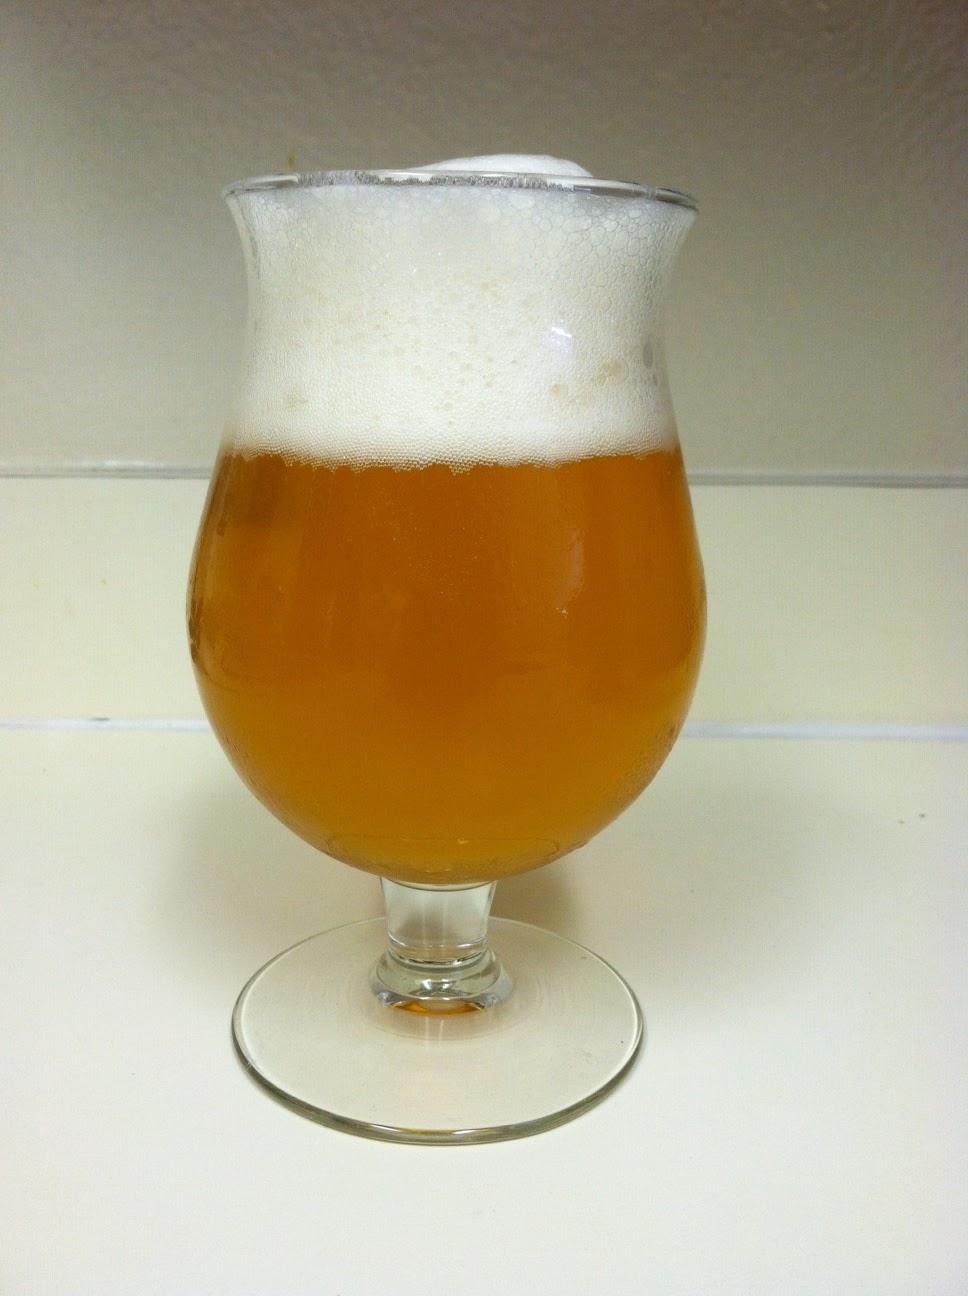 Walker s Top Beers Boulevard Brewing Co Tank 7 Farmhouse Ale